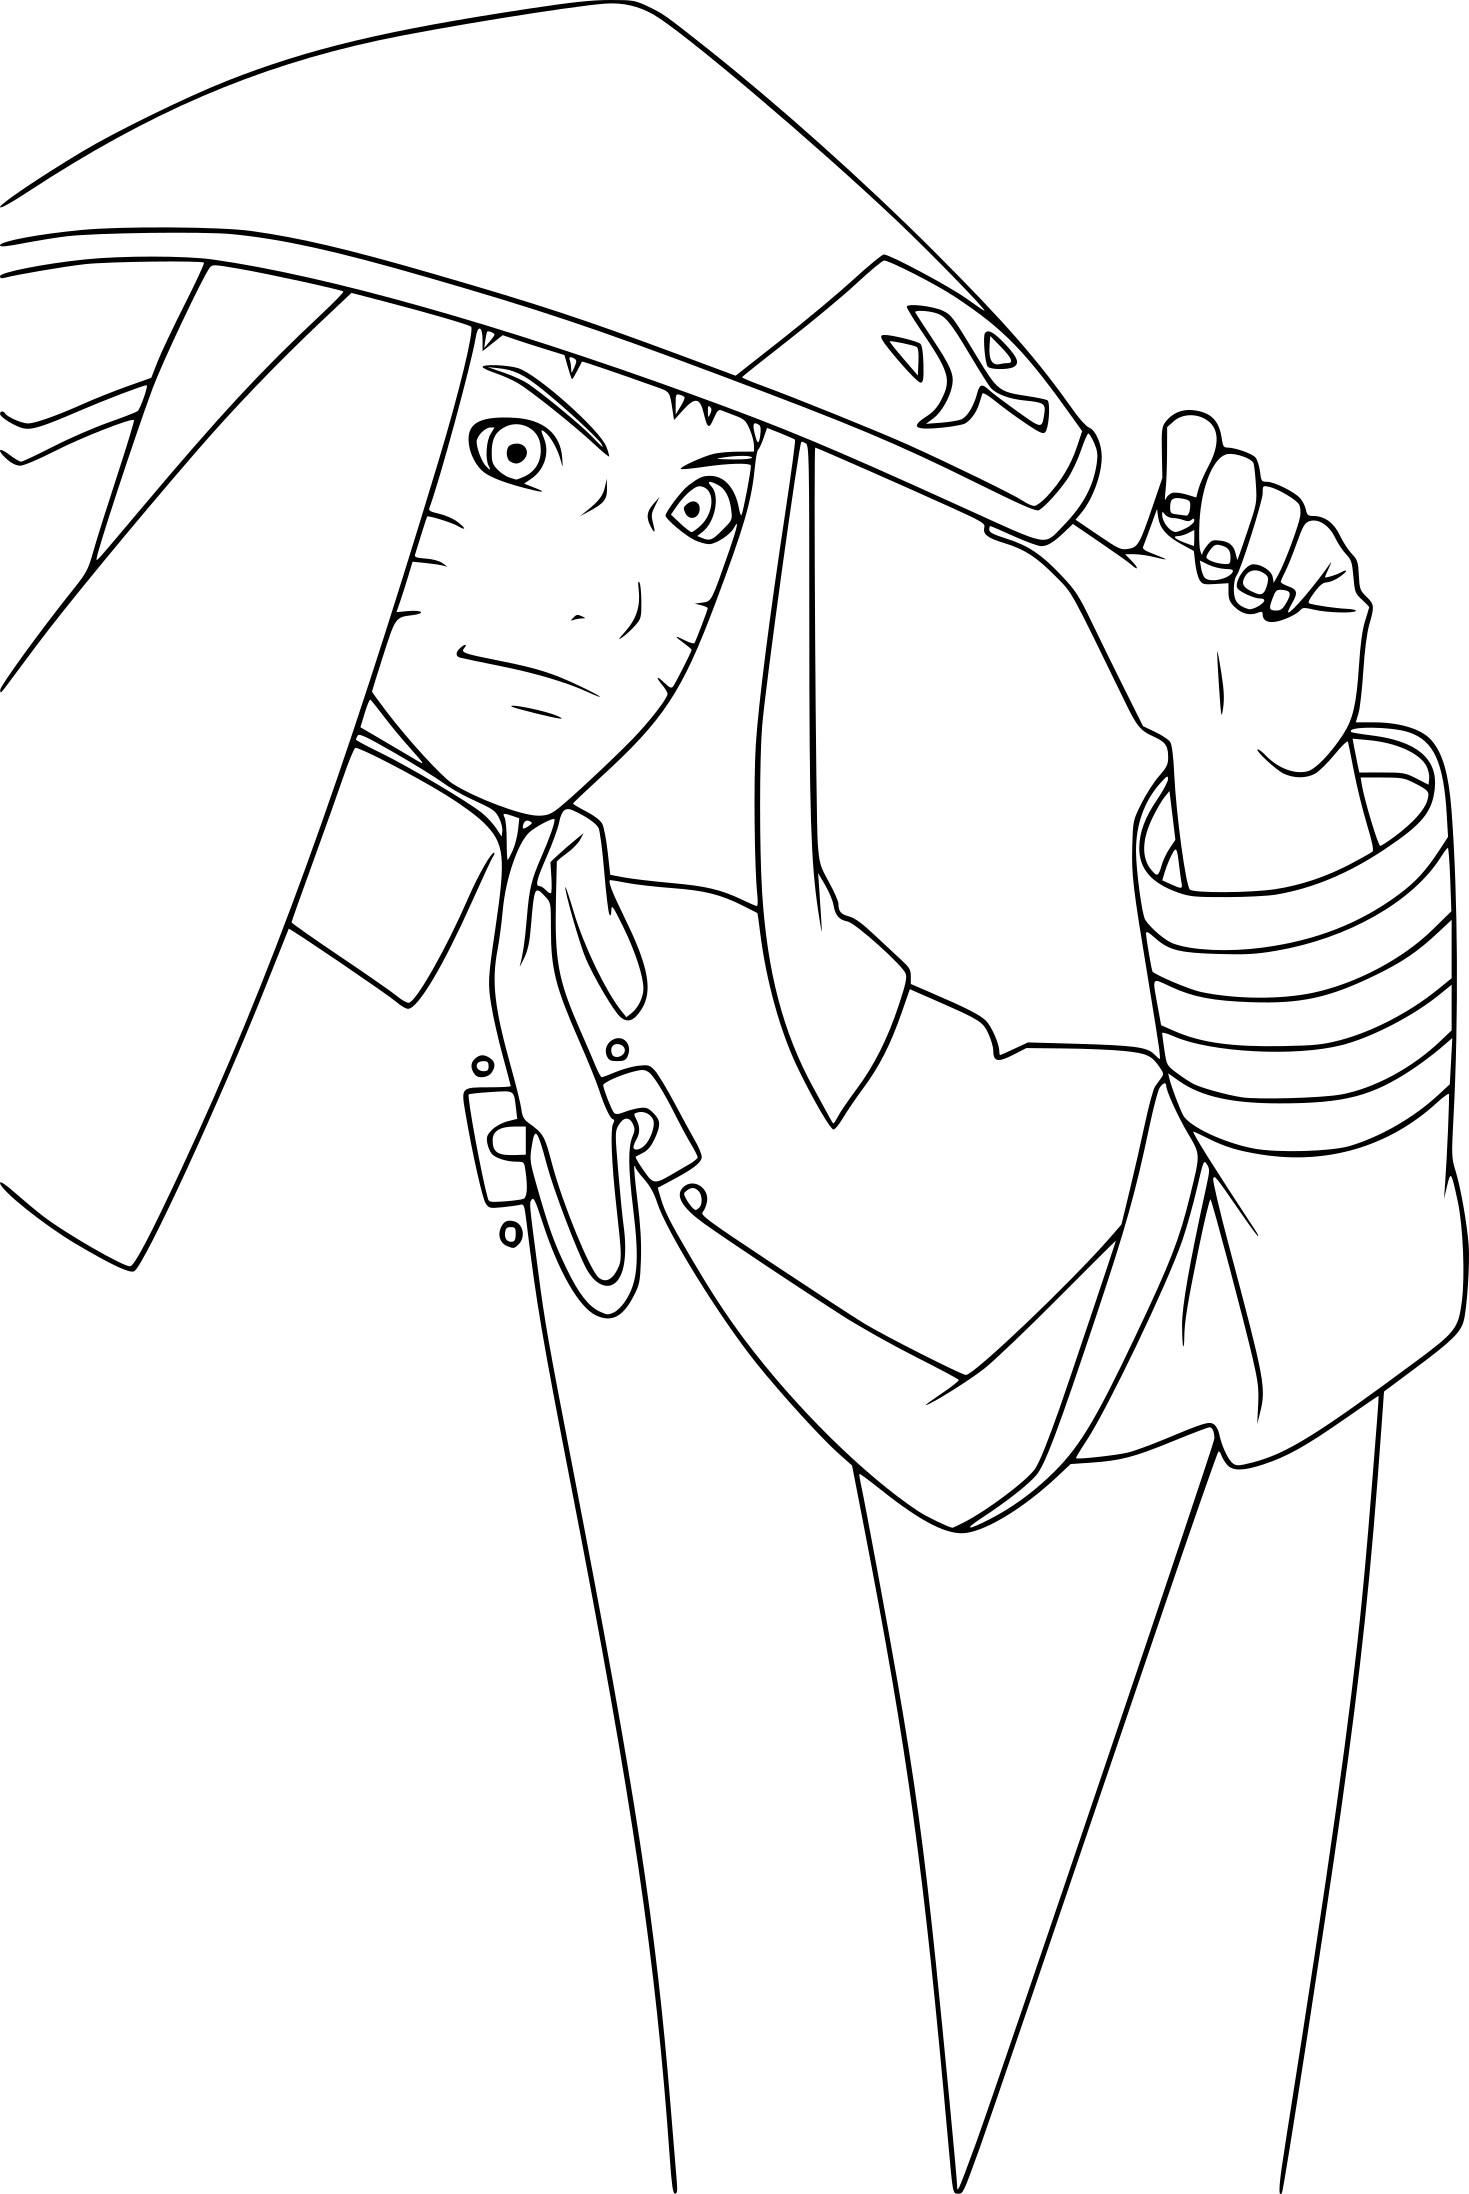 Coloriage De Naruto Hokage À Imprimer Sur Coloriage De tout Coloriage Naruto